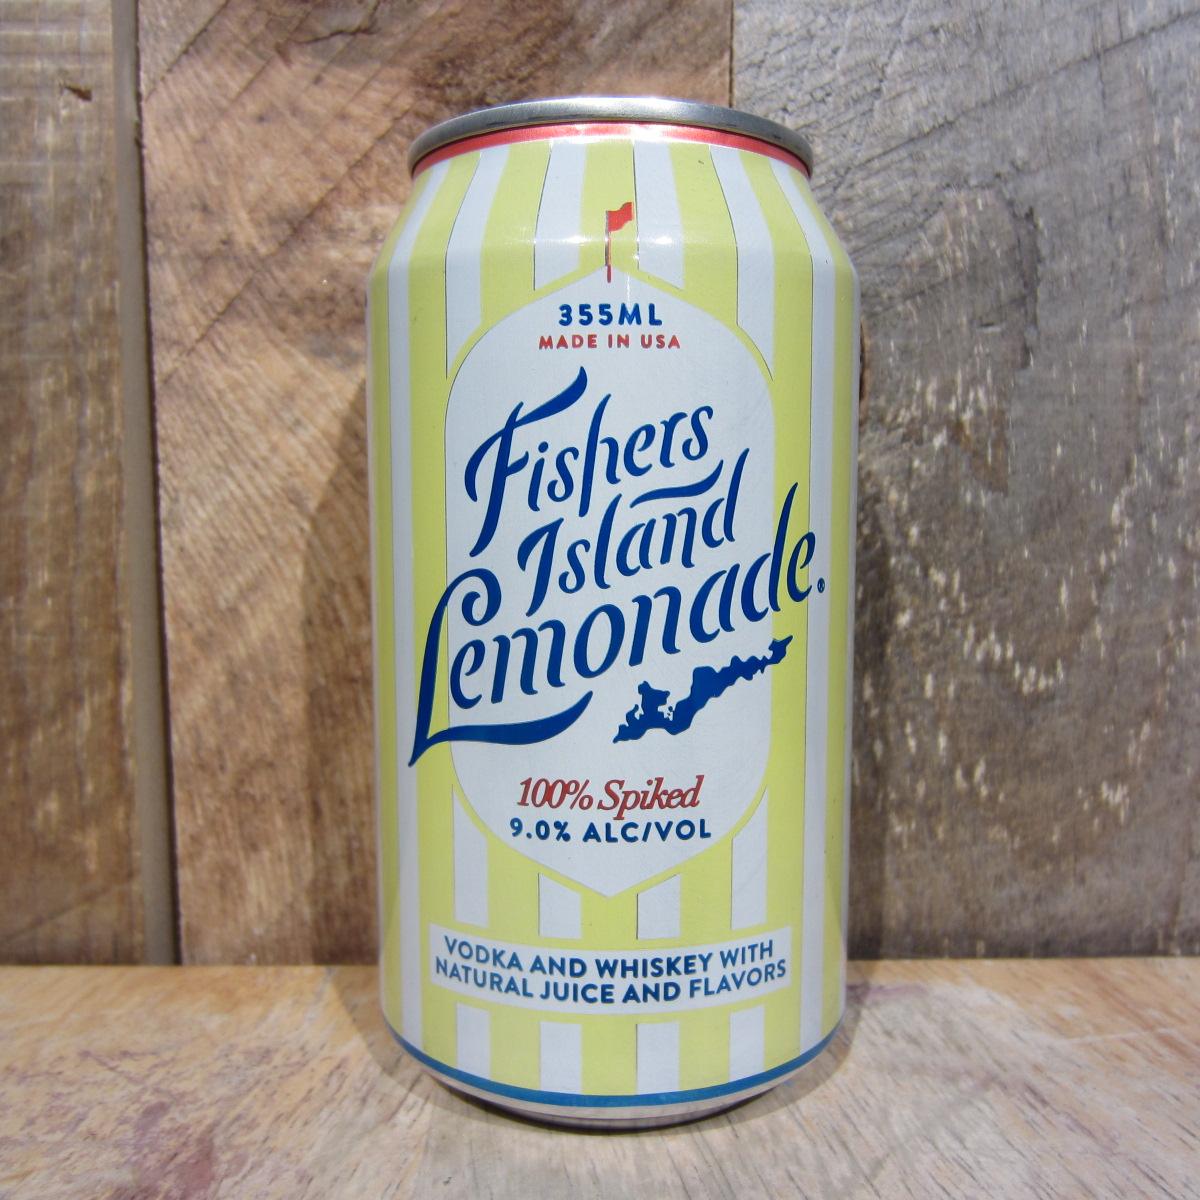 Fishers Island Lemonade 375ml (Can)